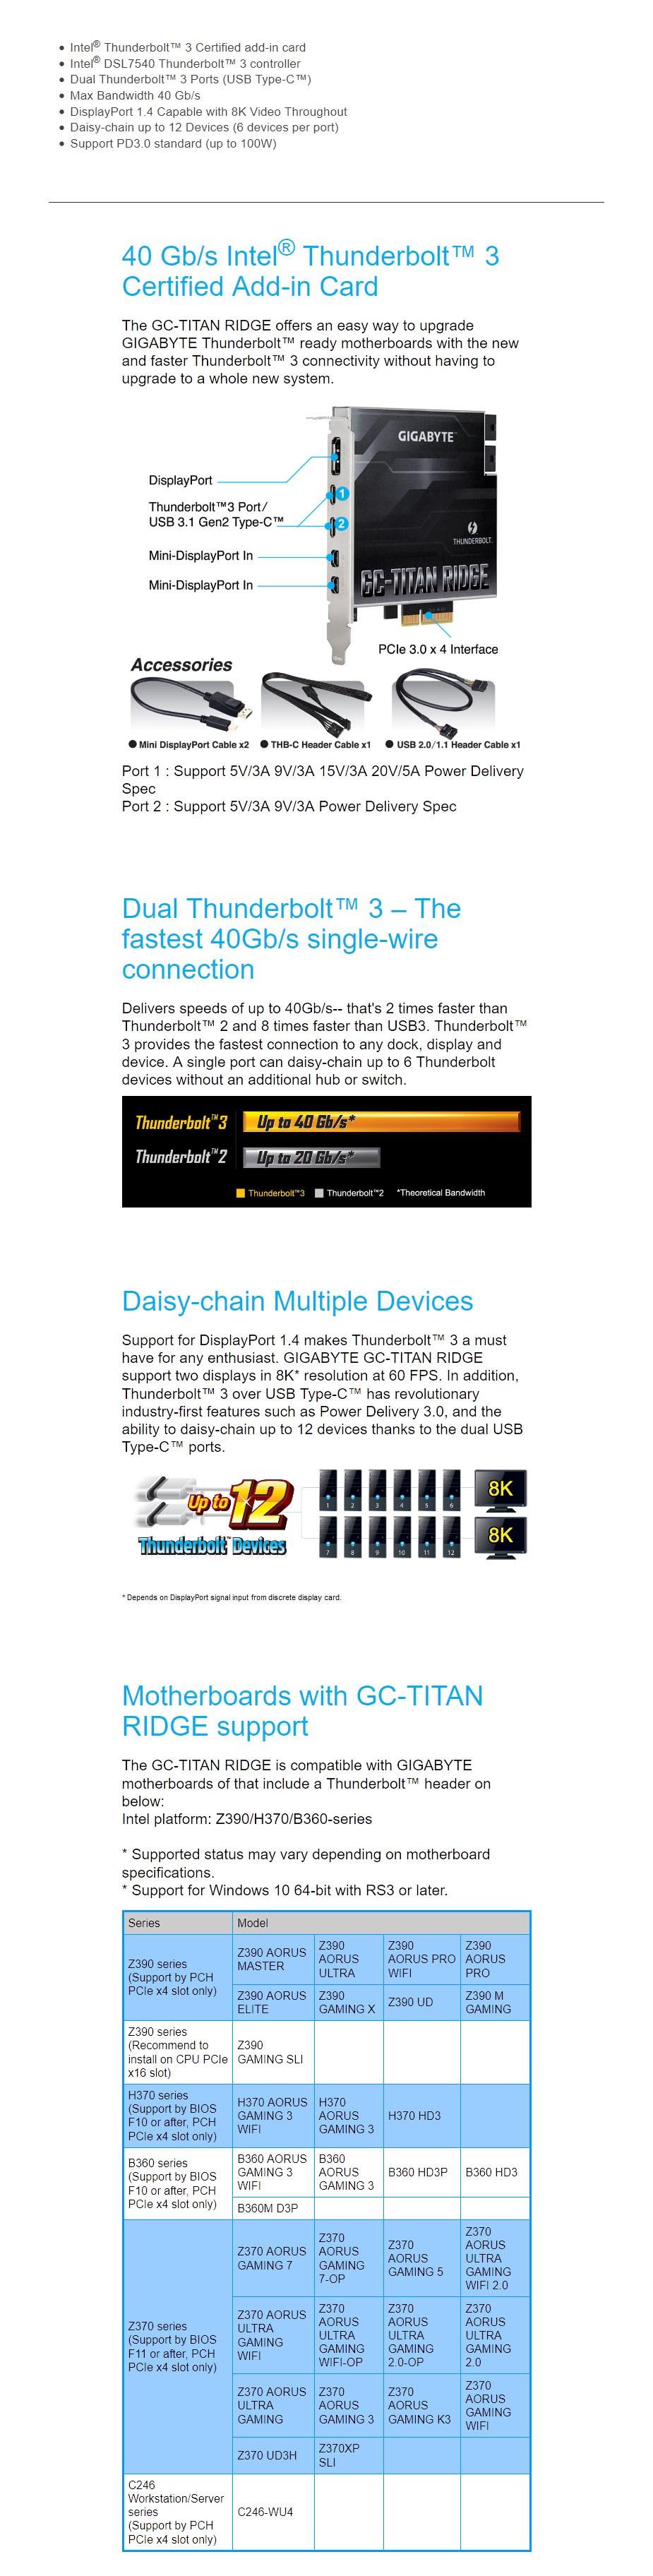 Gigabyte Titan Ridge Dual Thunderbolt 3 USB Type-C PCIe Card - Overview 1